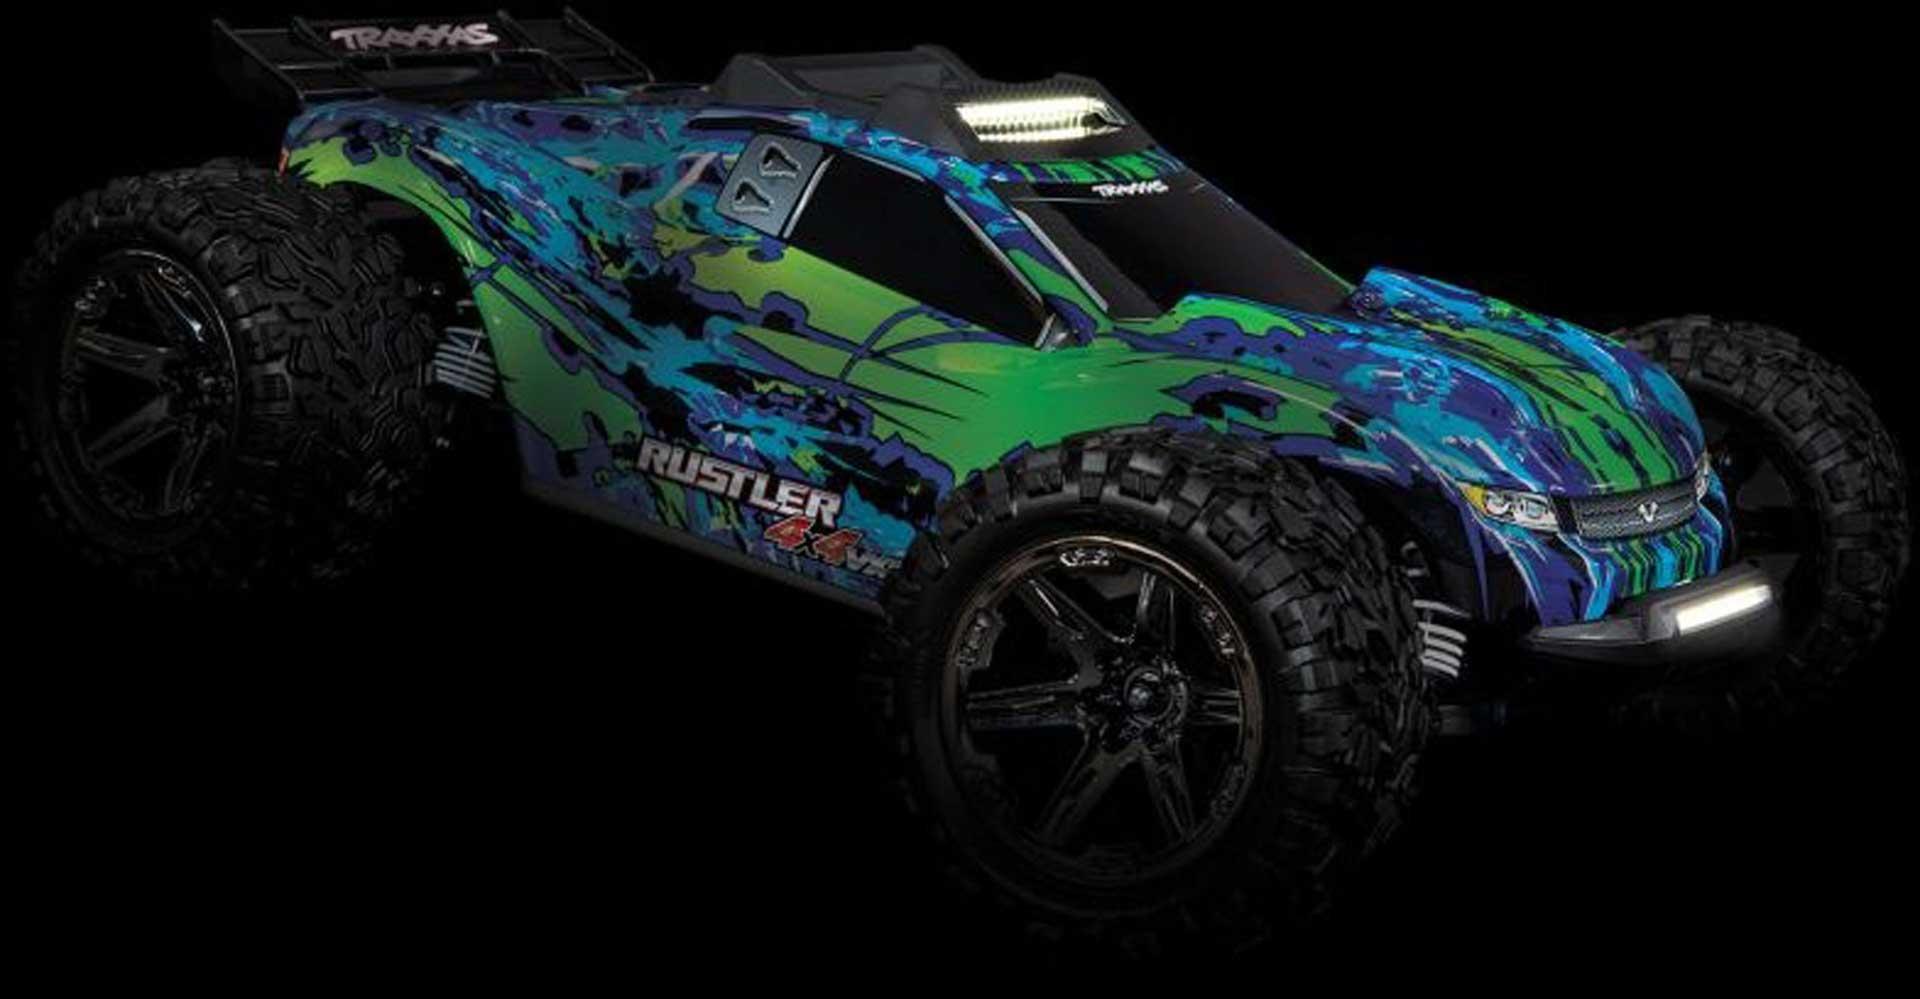 TRAXXAS LED Licht-Set Rustler 4x4